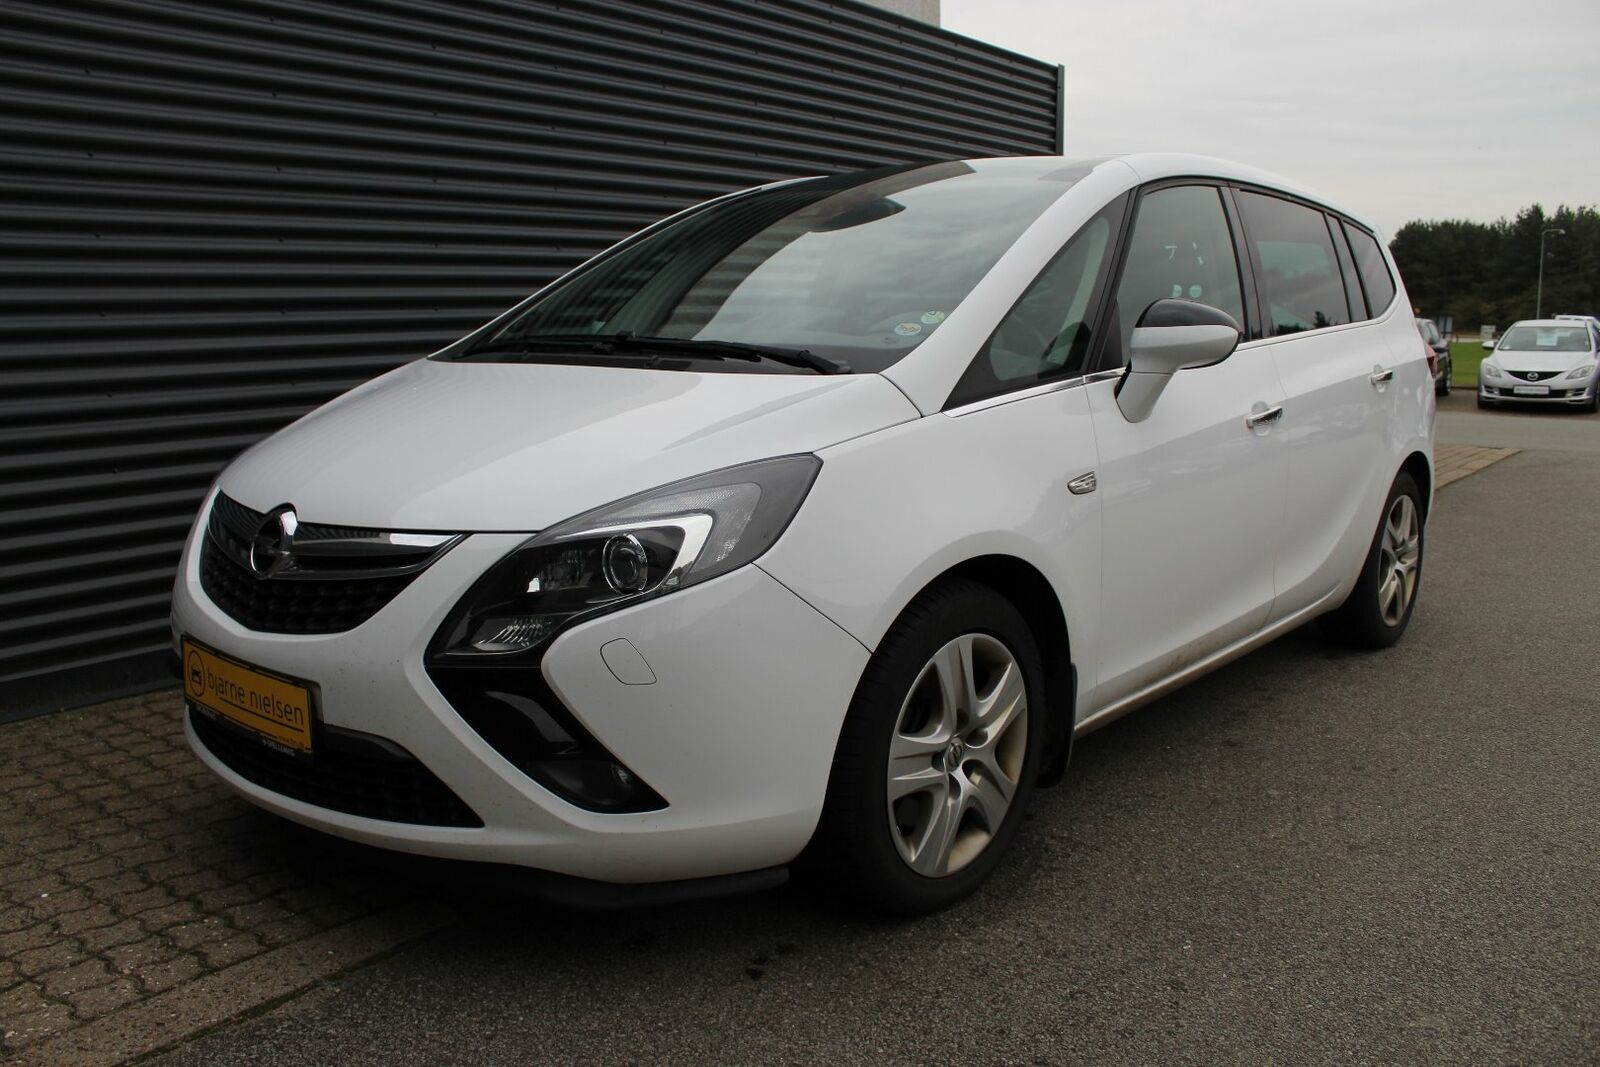 Opel Zafira Billede 6